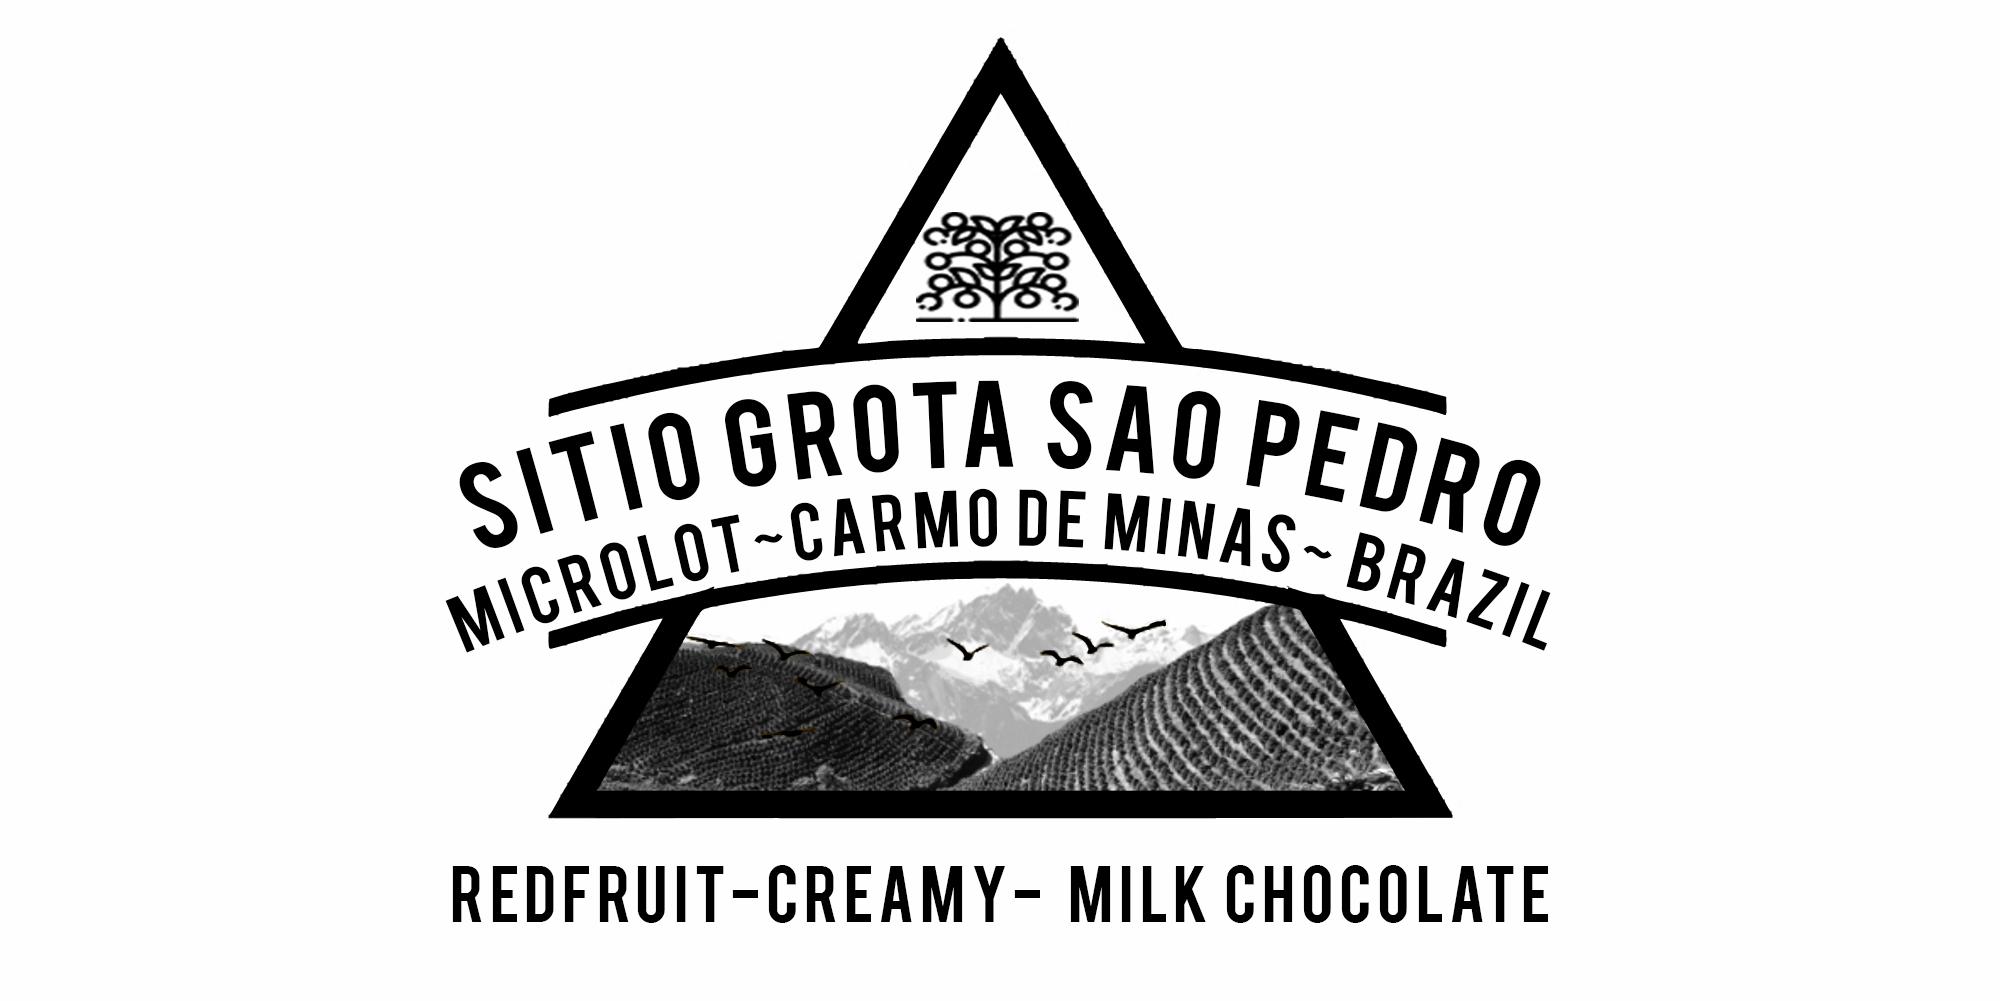 BRAZIL SITIO GROTA microlot